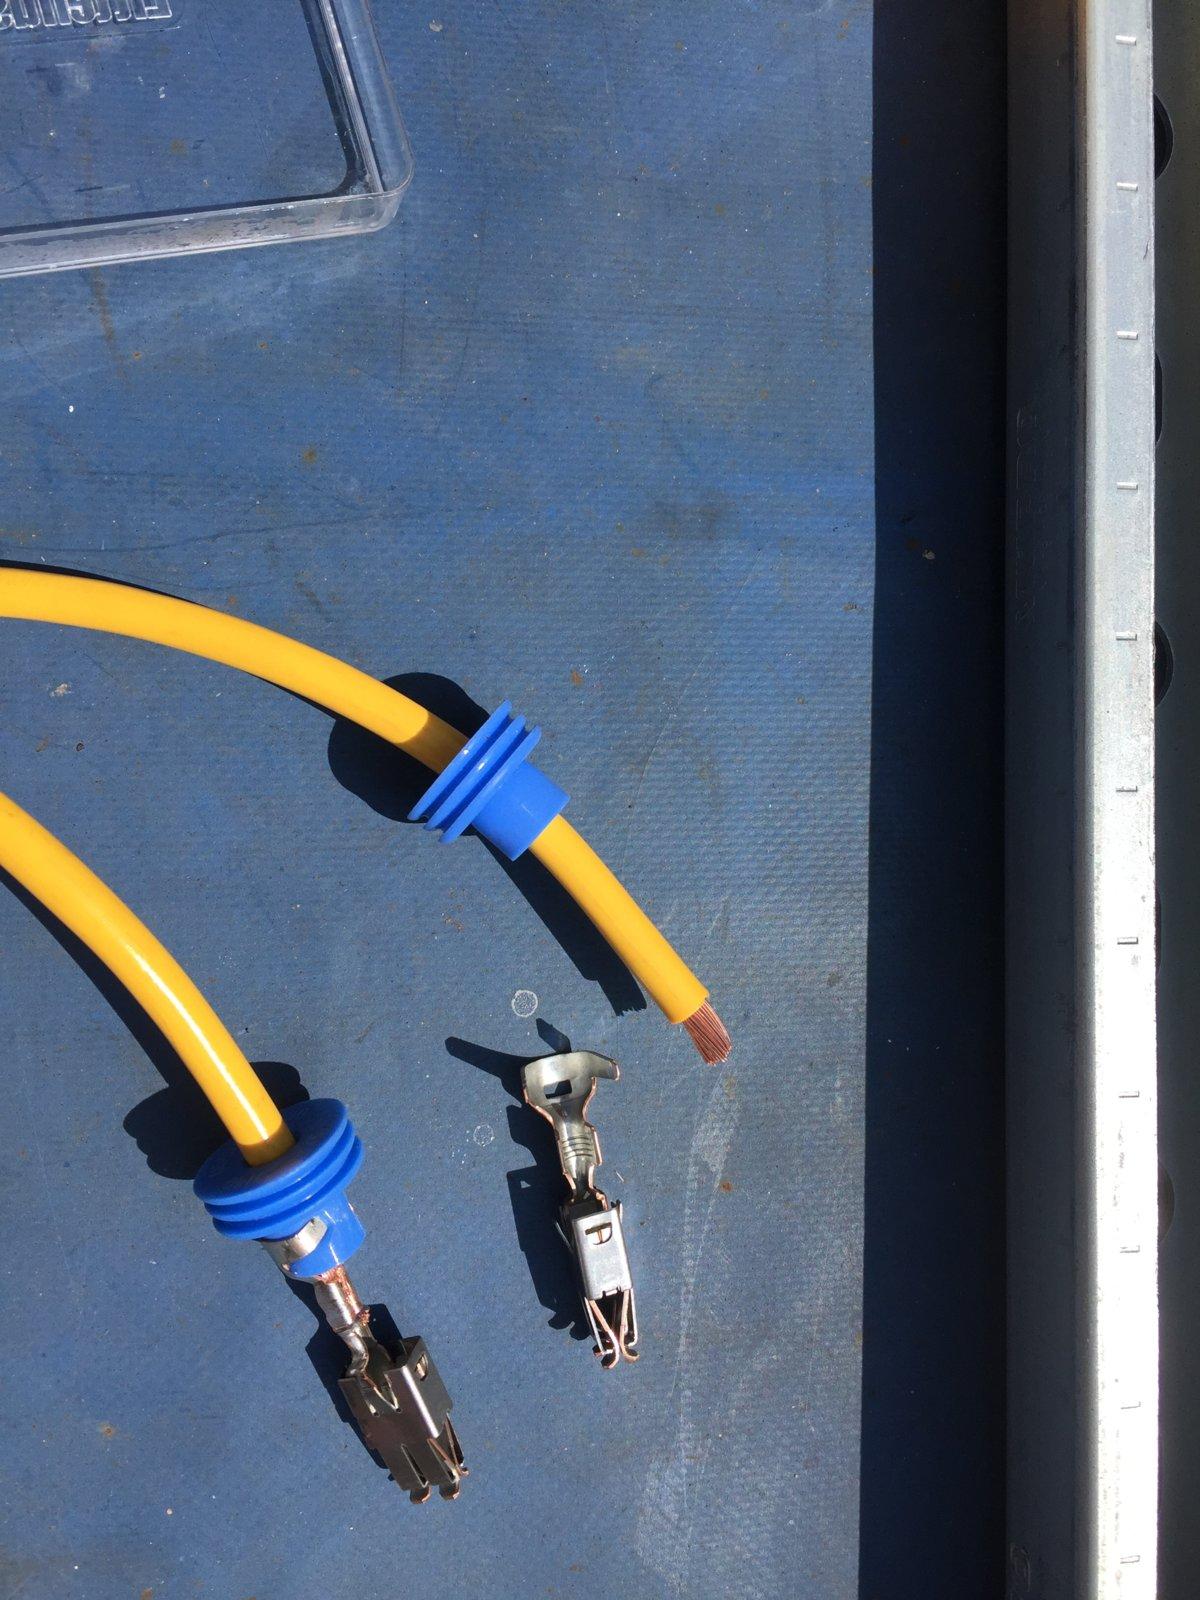 Intervolt DCC Pro DC DC split charge system | Land Cruiser Club